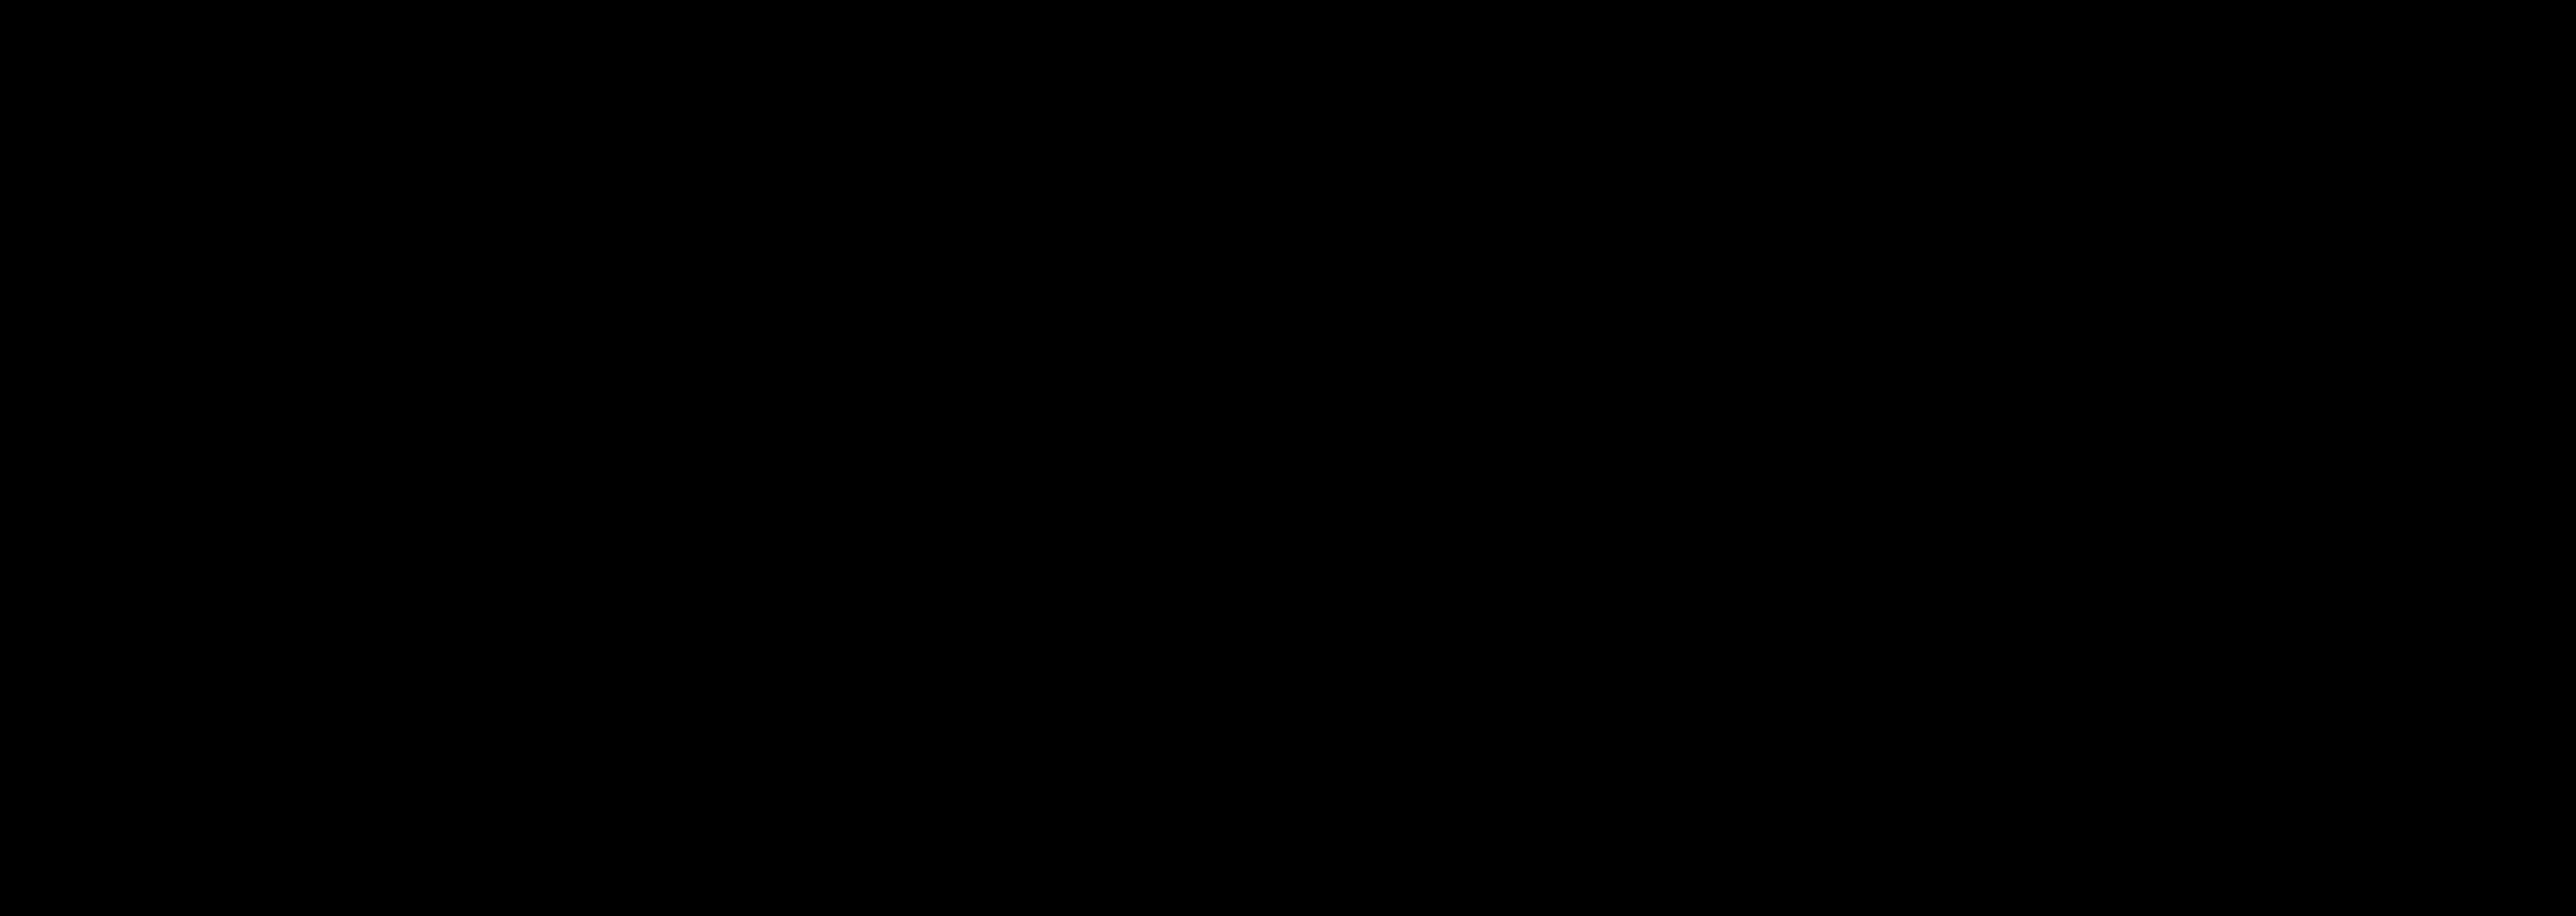 N2-t-Boc-N<sub>6</sub>-(biotinamido-6-N-caproylamido)lysinylamidoethane Methanethiosulfonate